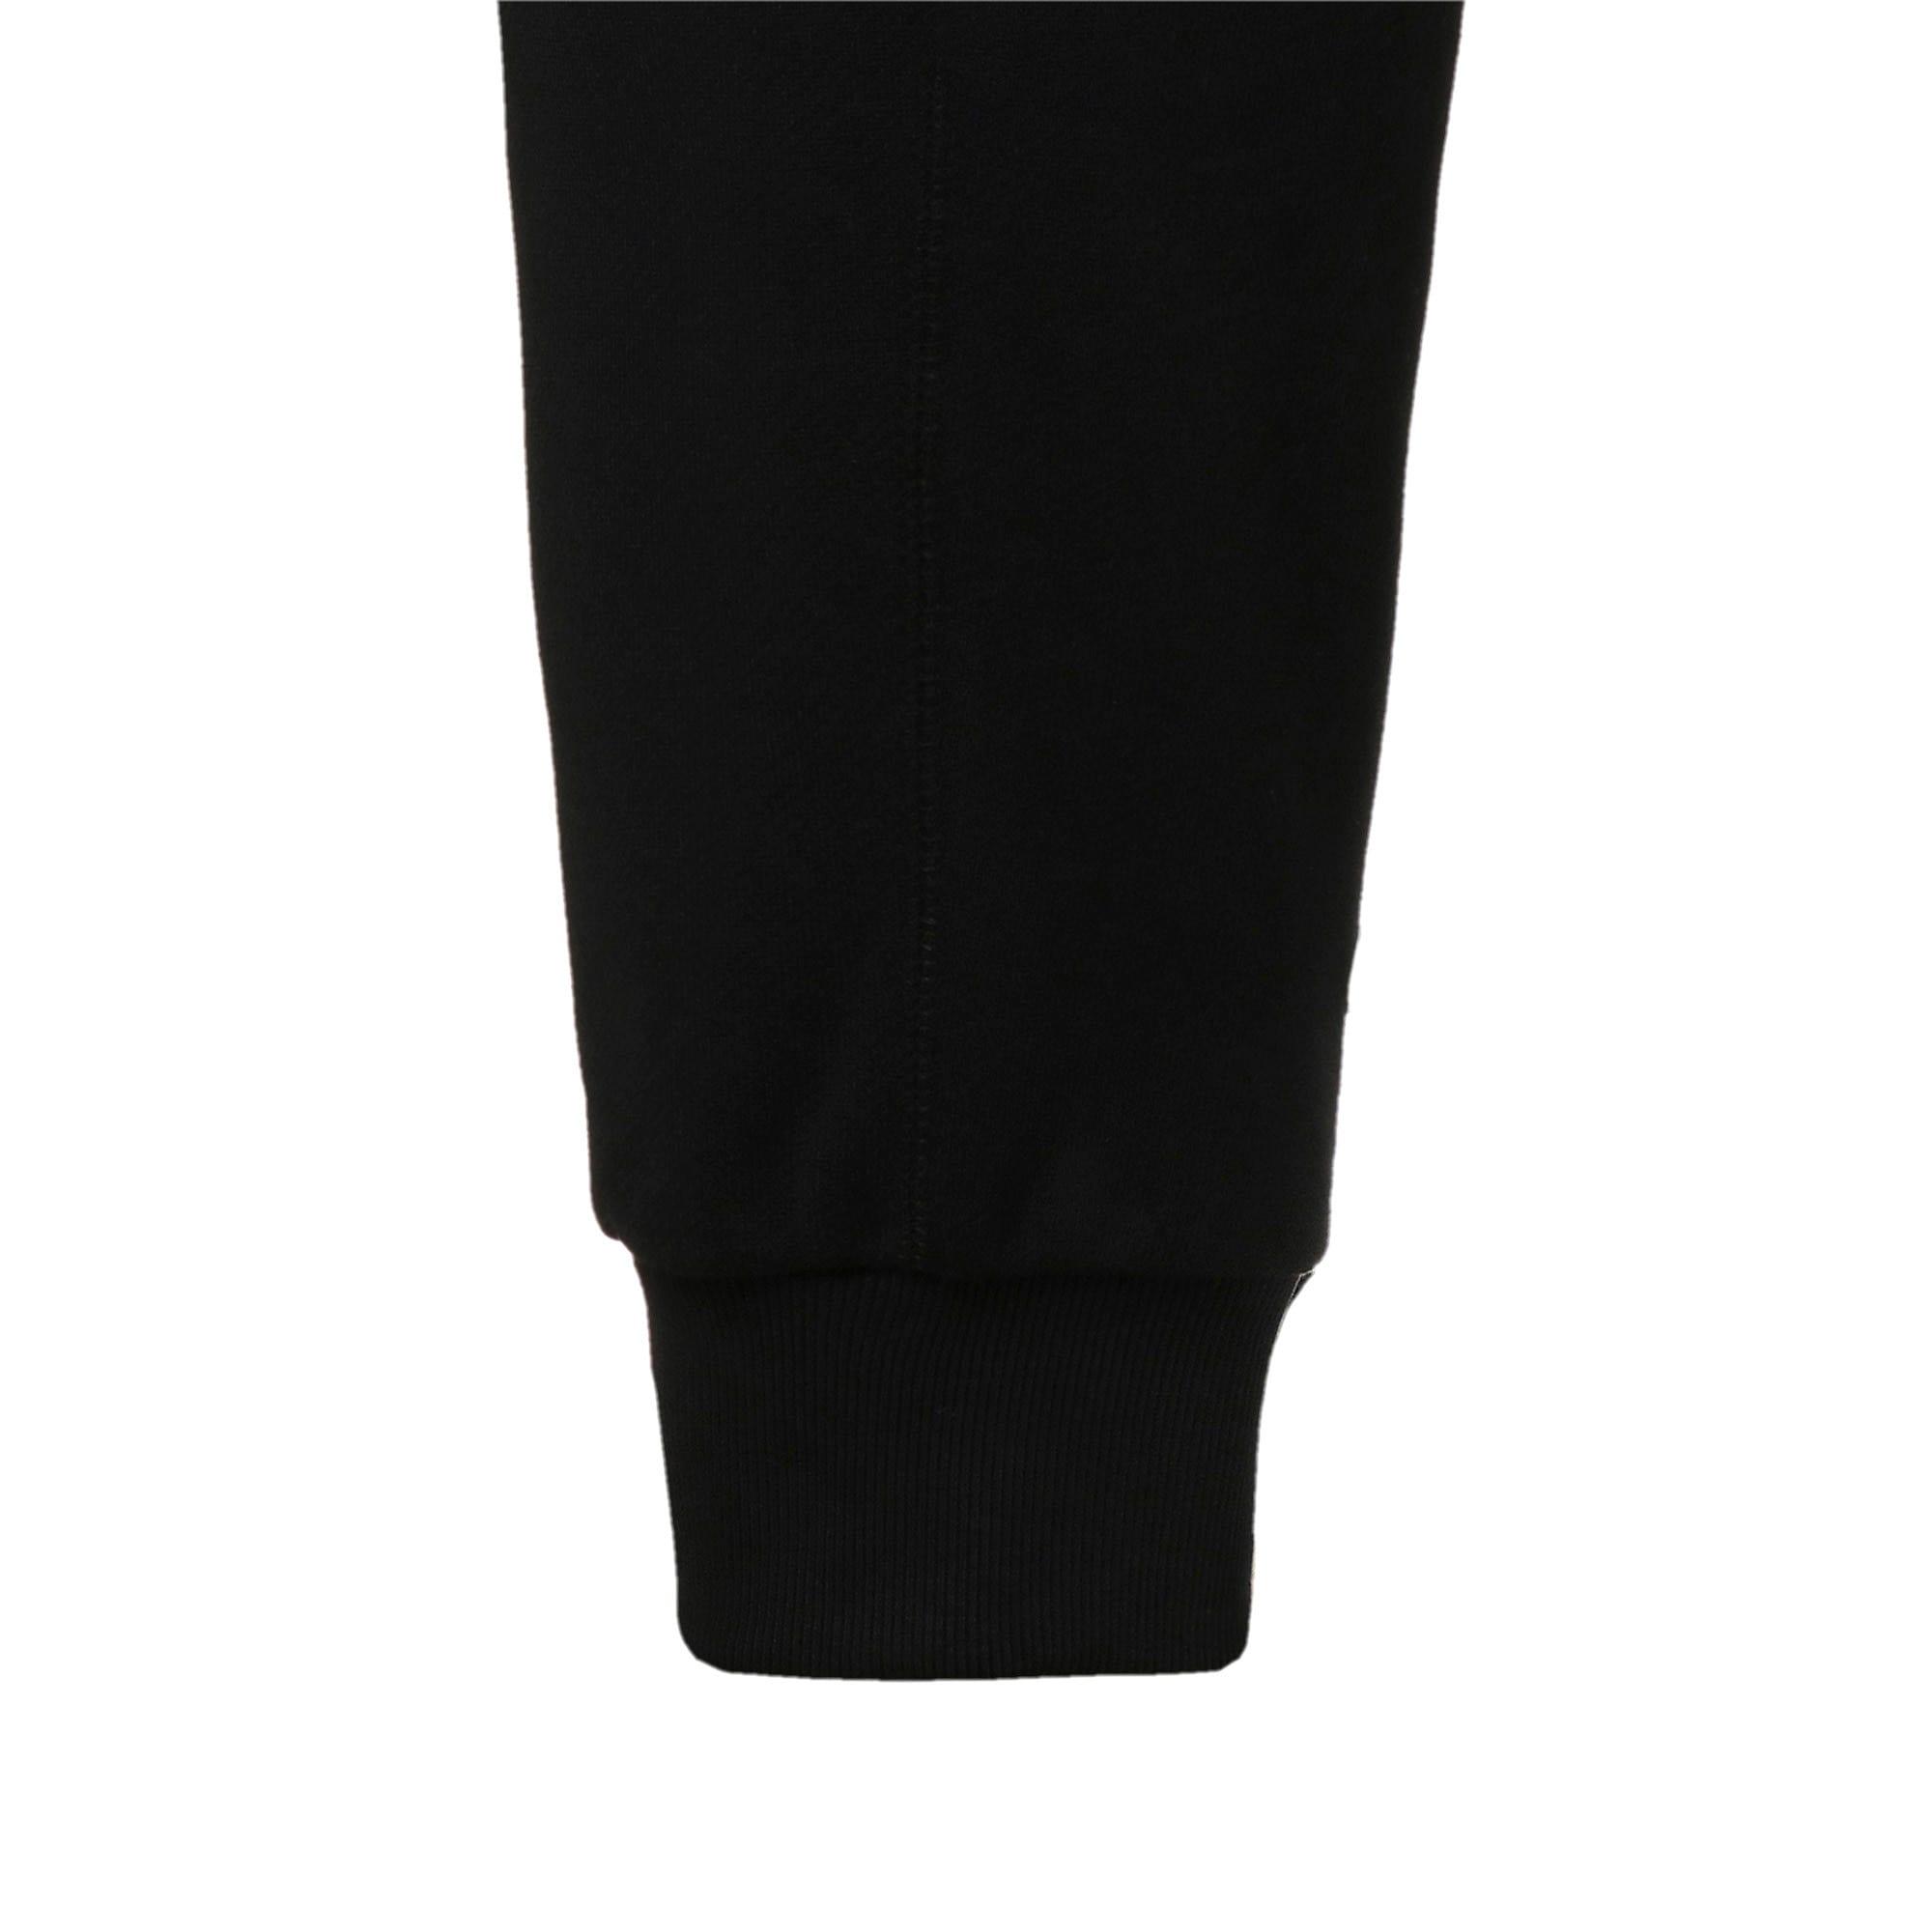 Thumbnail 6 of HEAVY CLASSICS パンツ, Cotton Black, medium-JPN